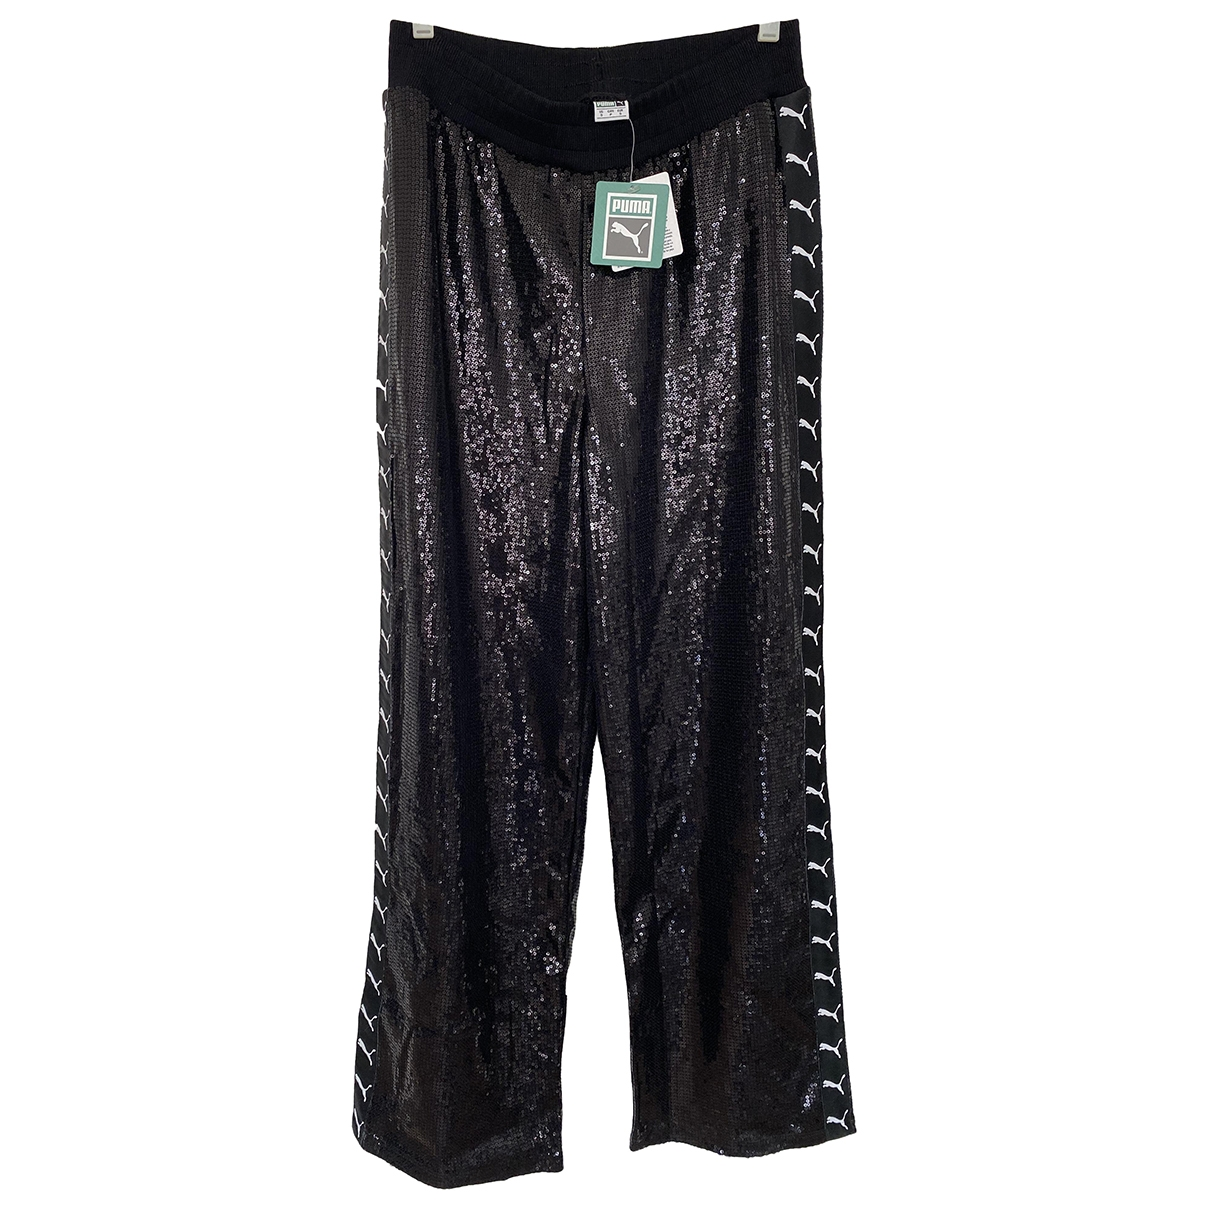 Puma \N Black Cotton Trousers for Women S International